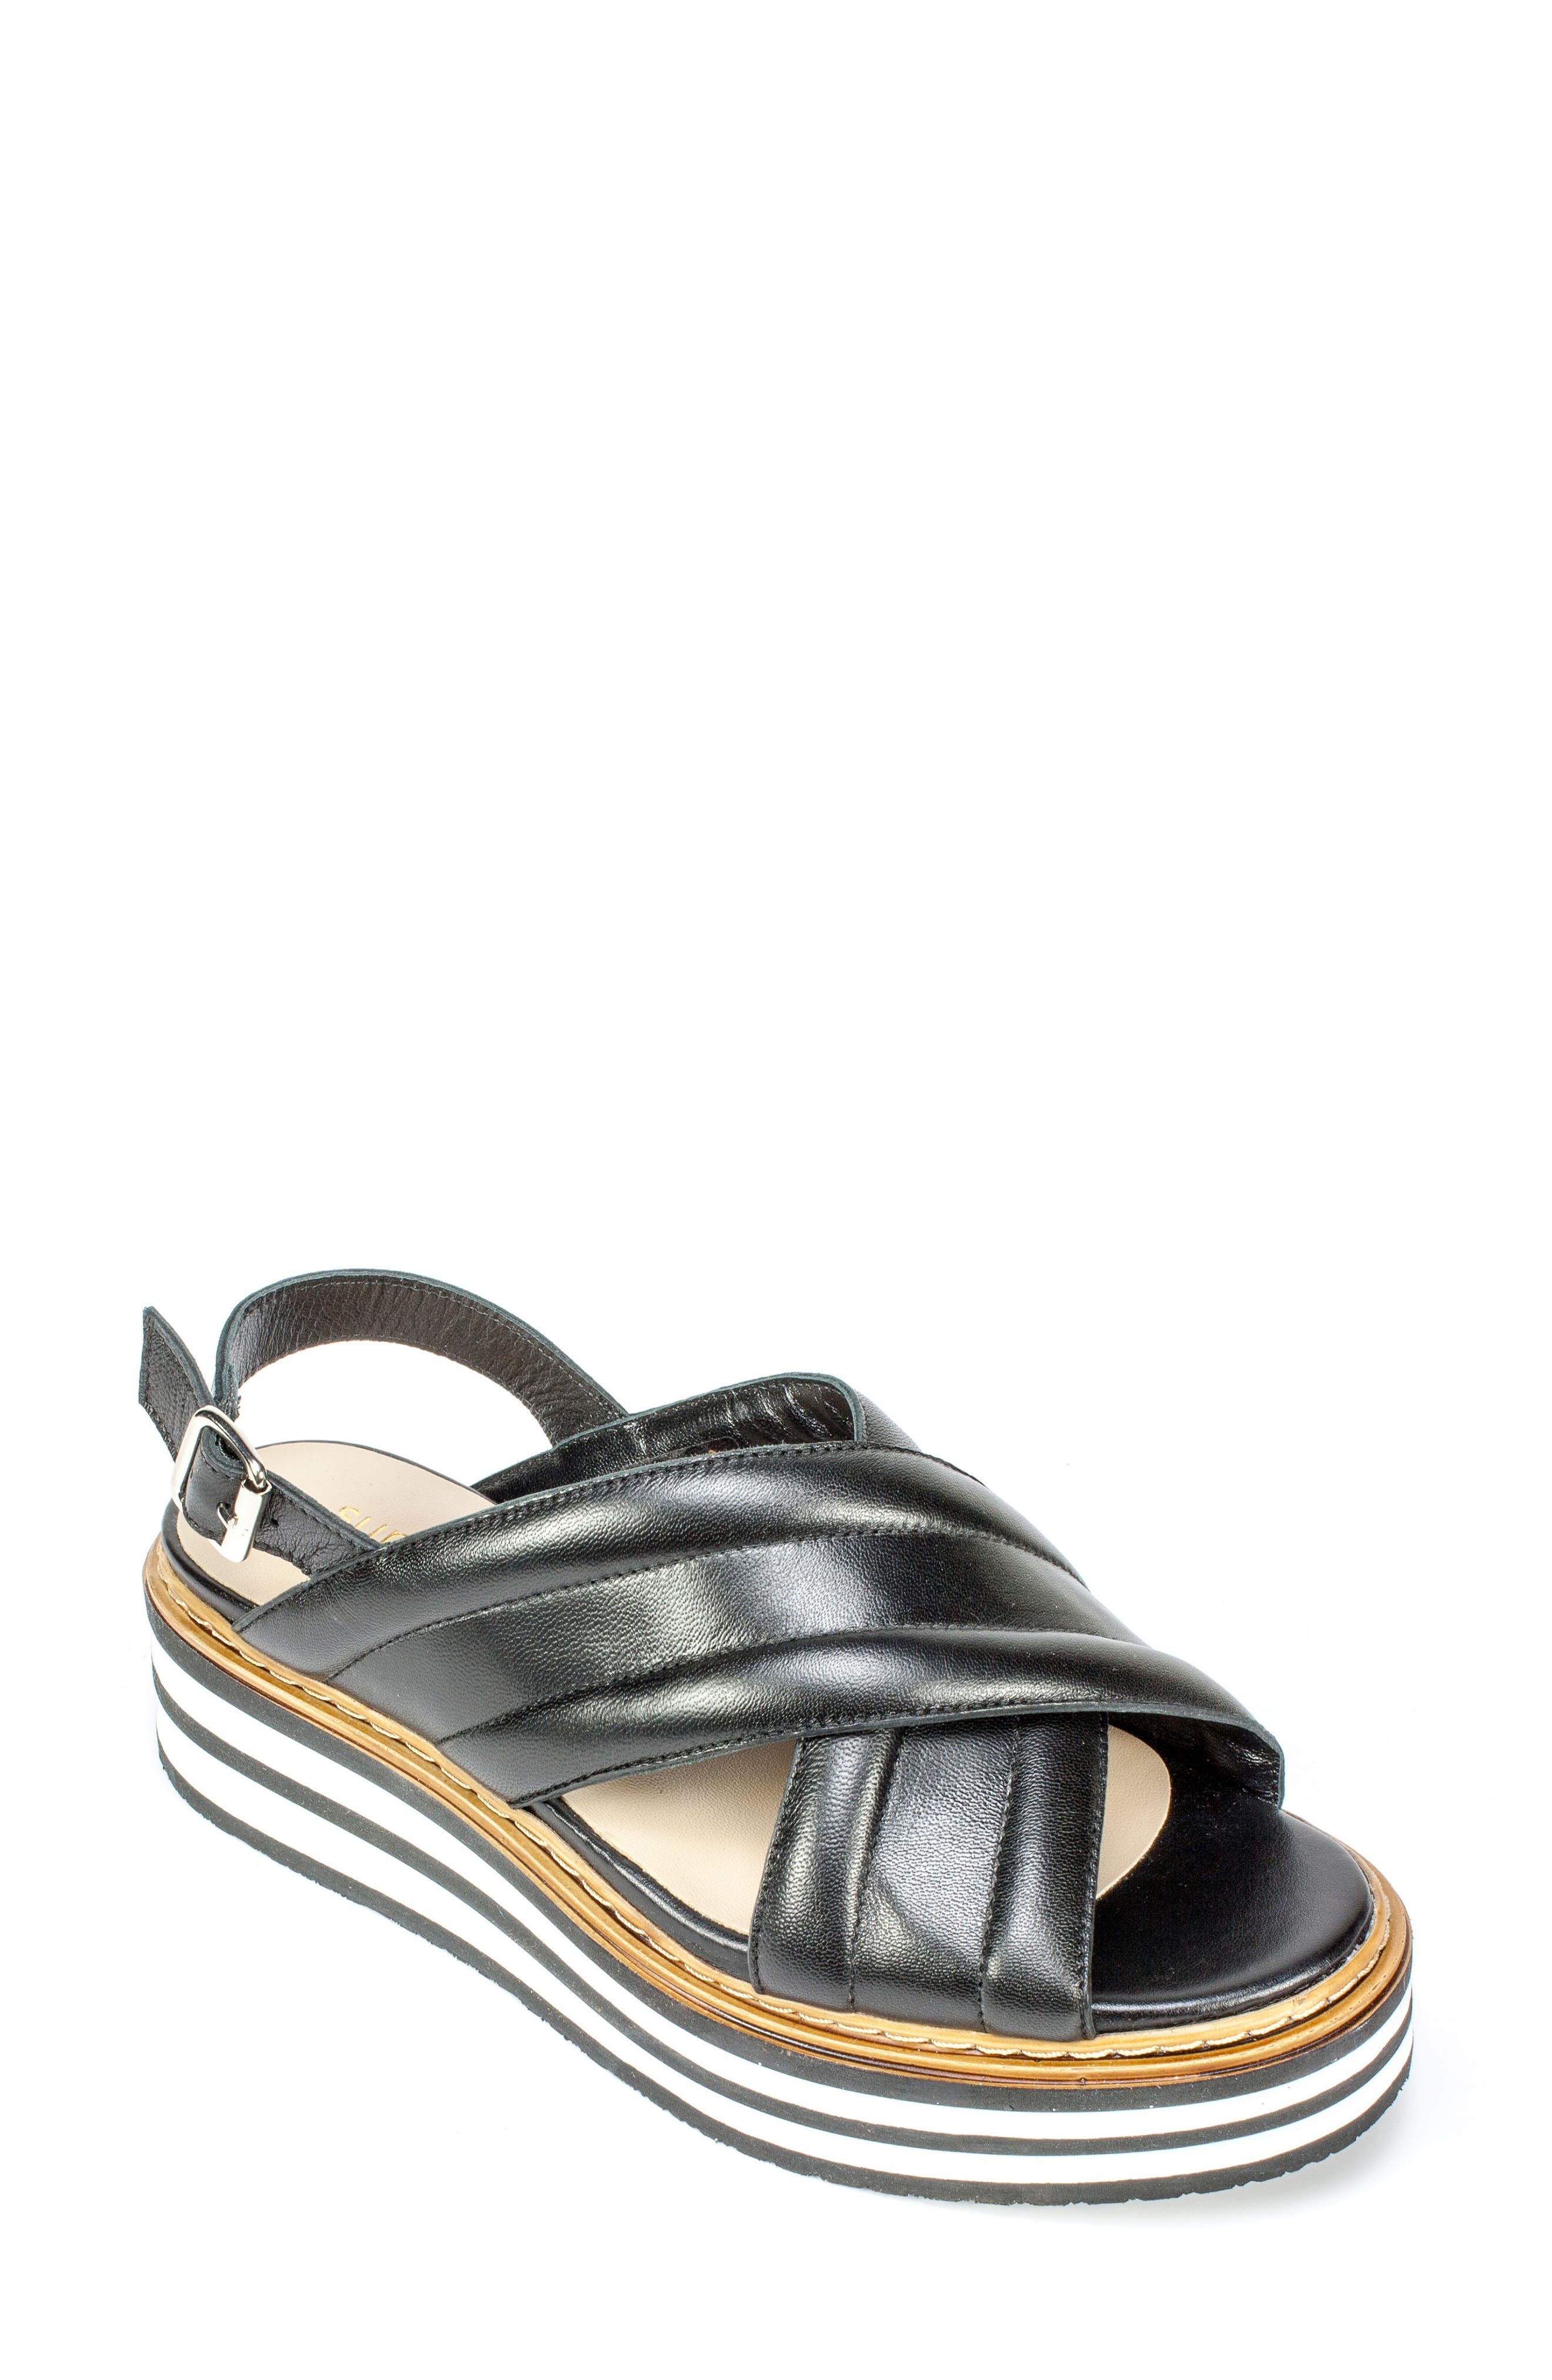 Leanna Platform Sandal,                         Main,                         color, Black Leather